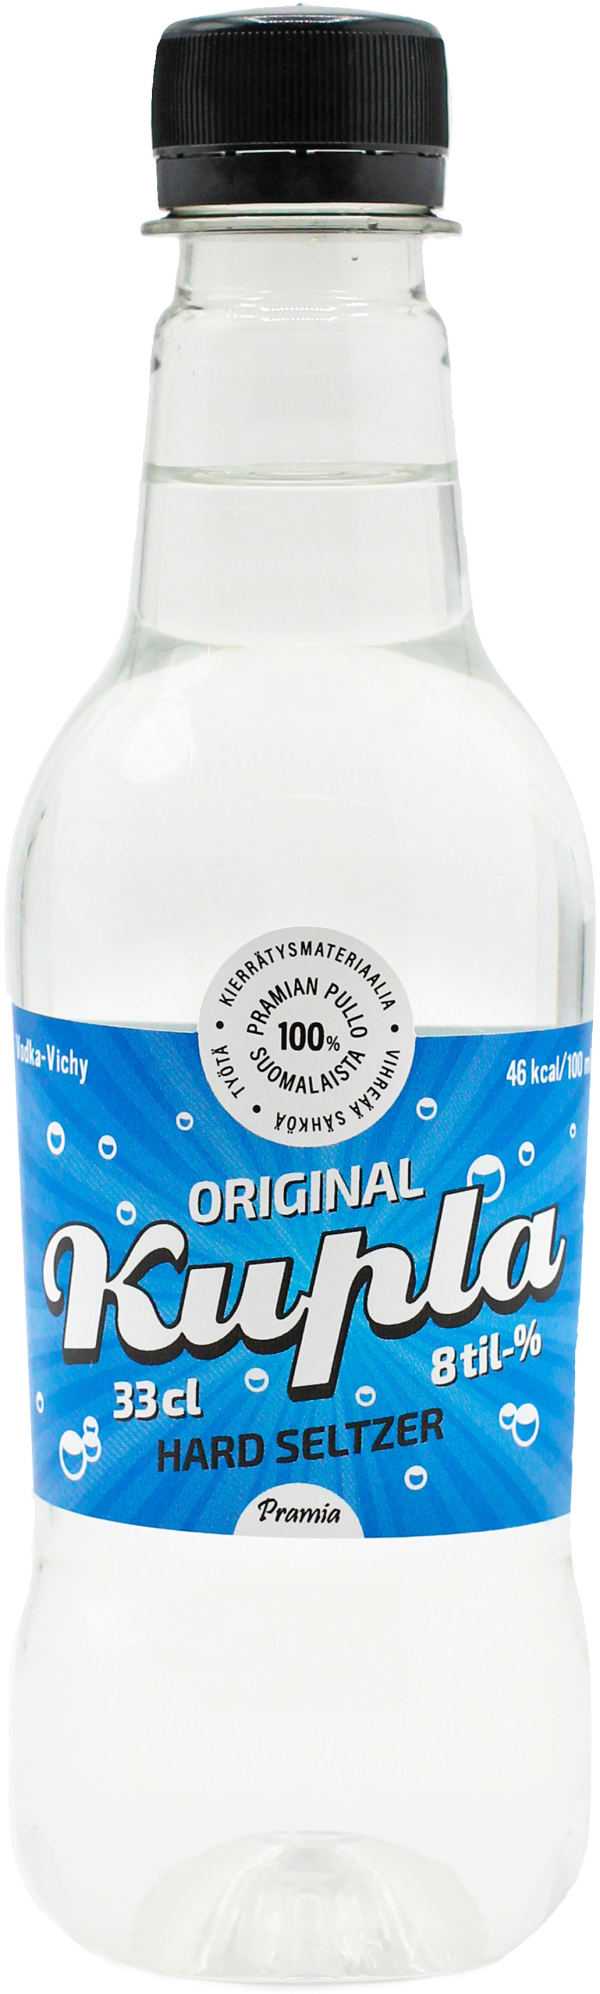 Kupla Maustamaton Lonkero plastic bottle